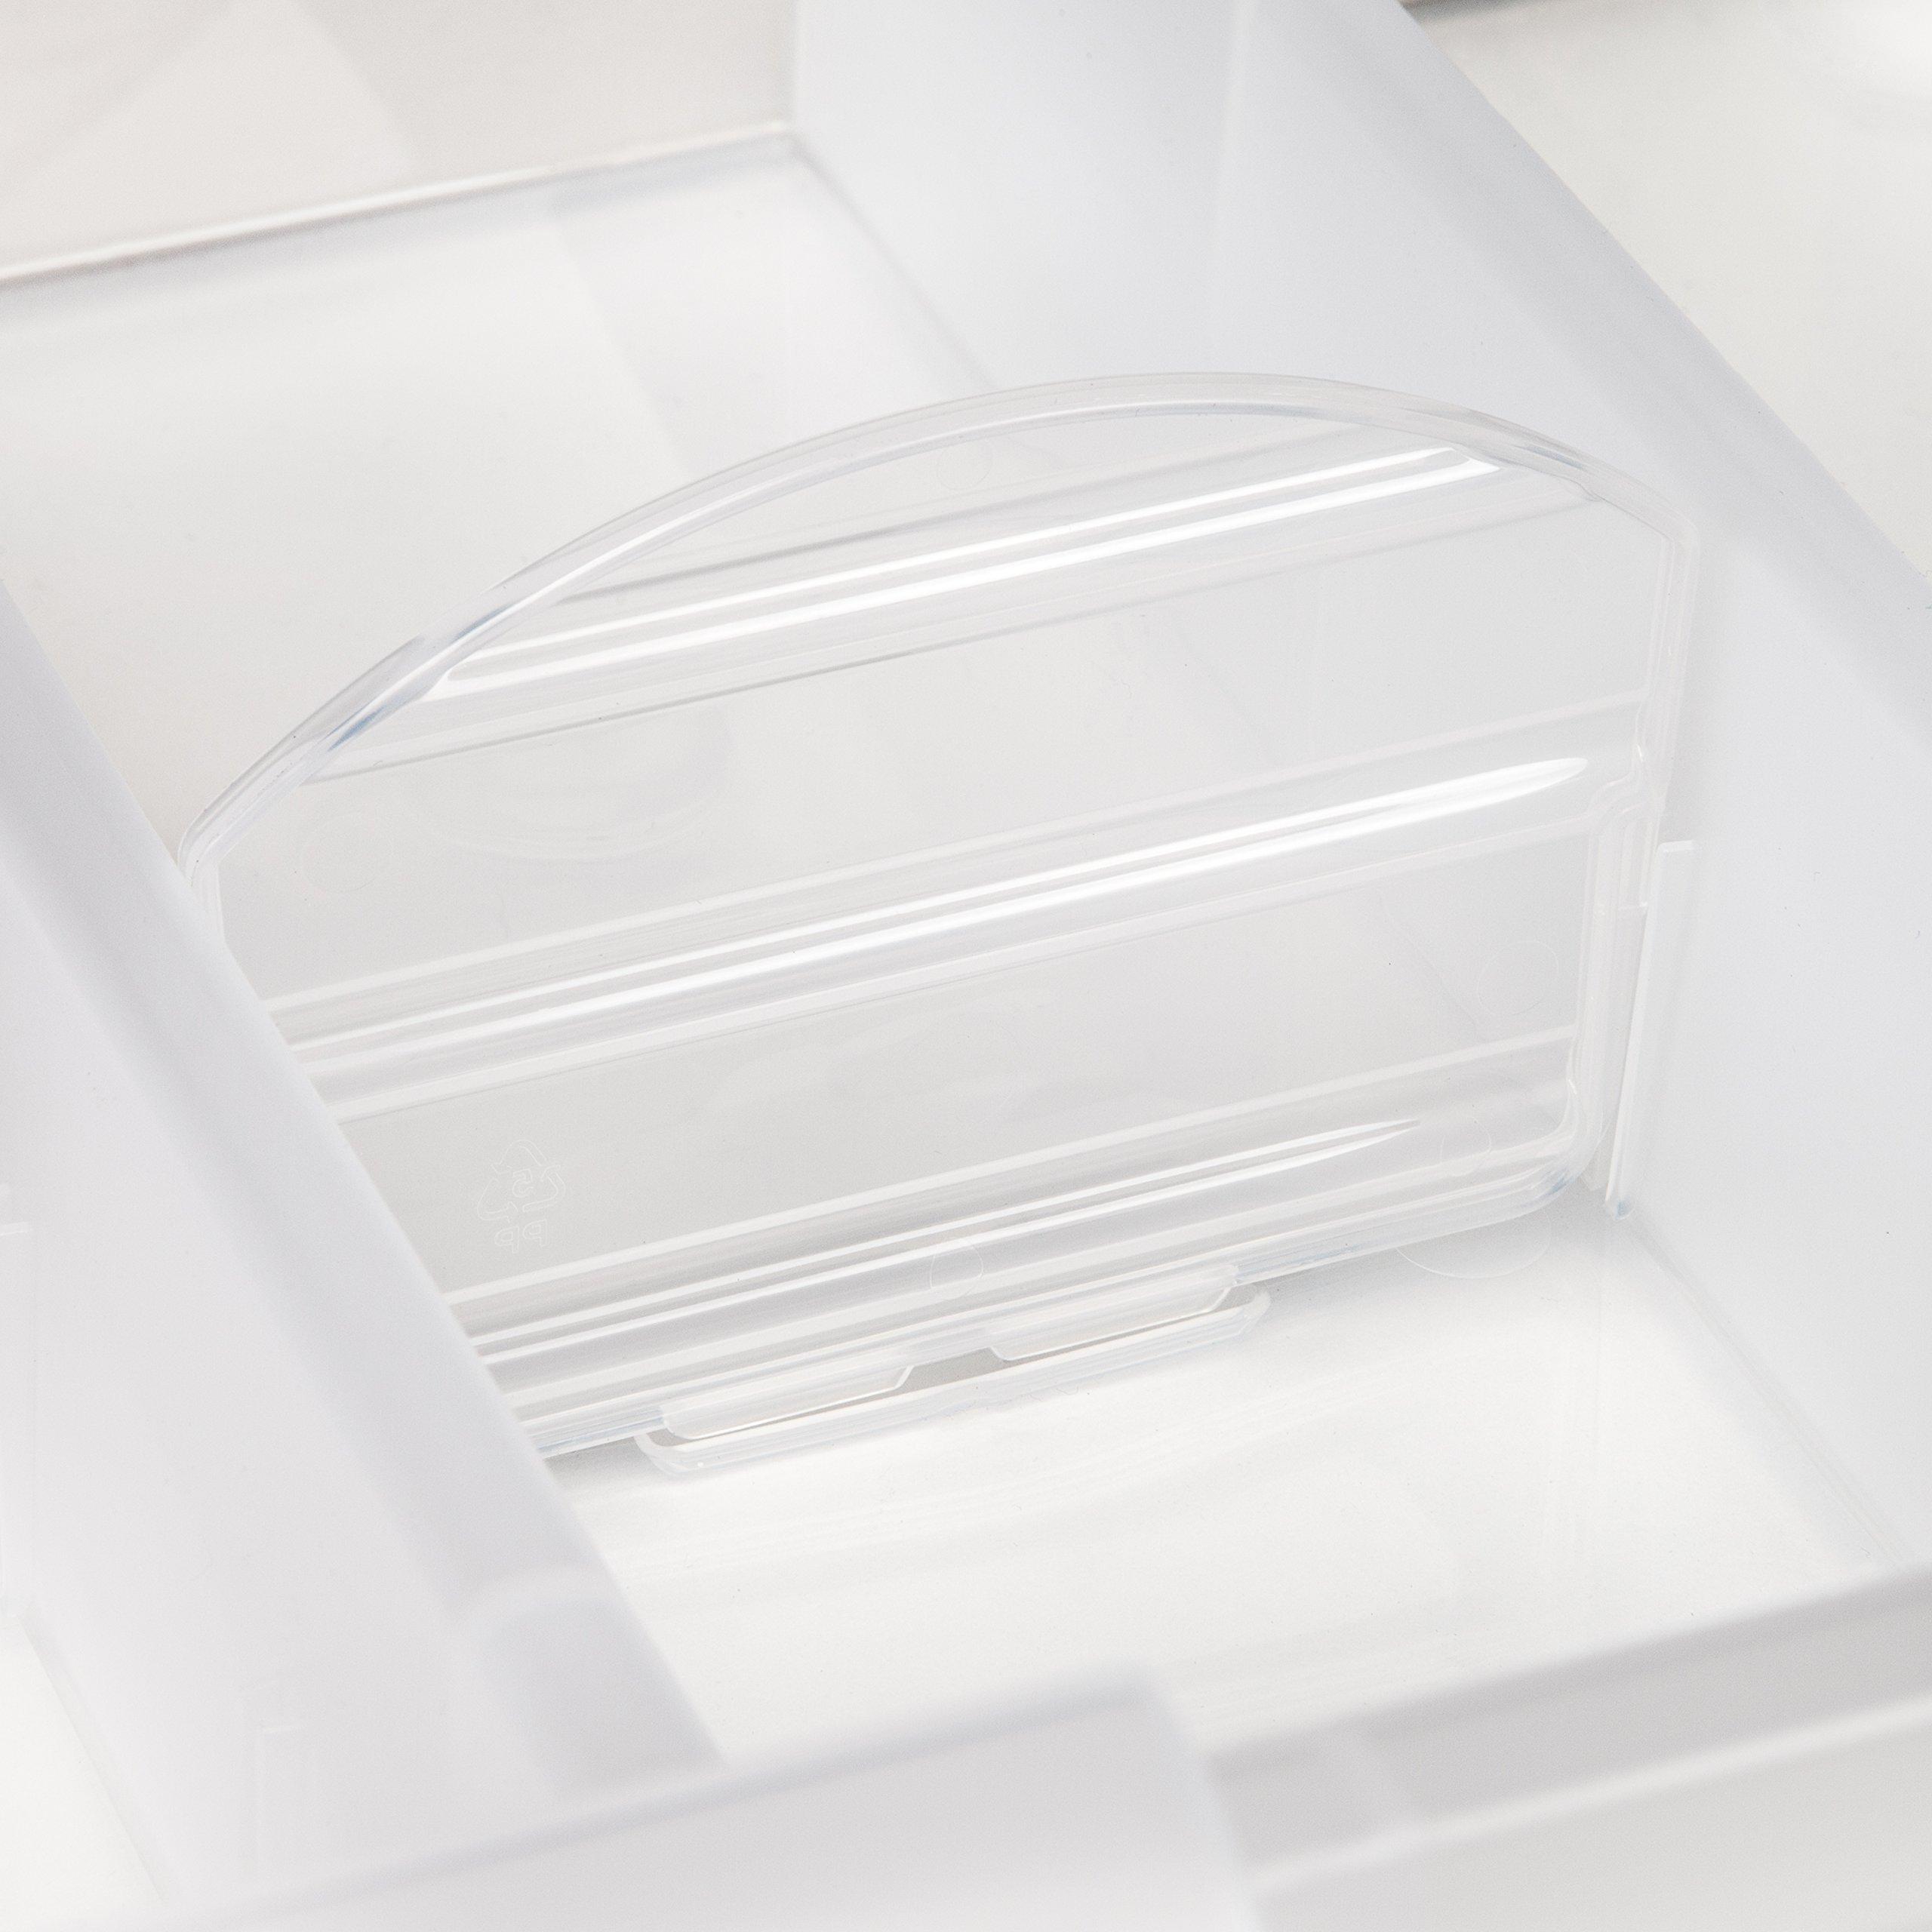 IRIS Large Divided Media Storage Box, Clear by IRIS USA, Inc. (Image #7)